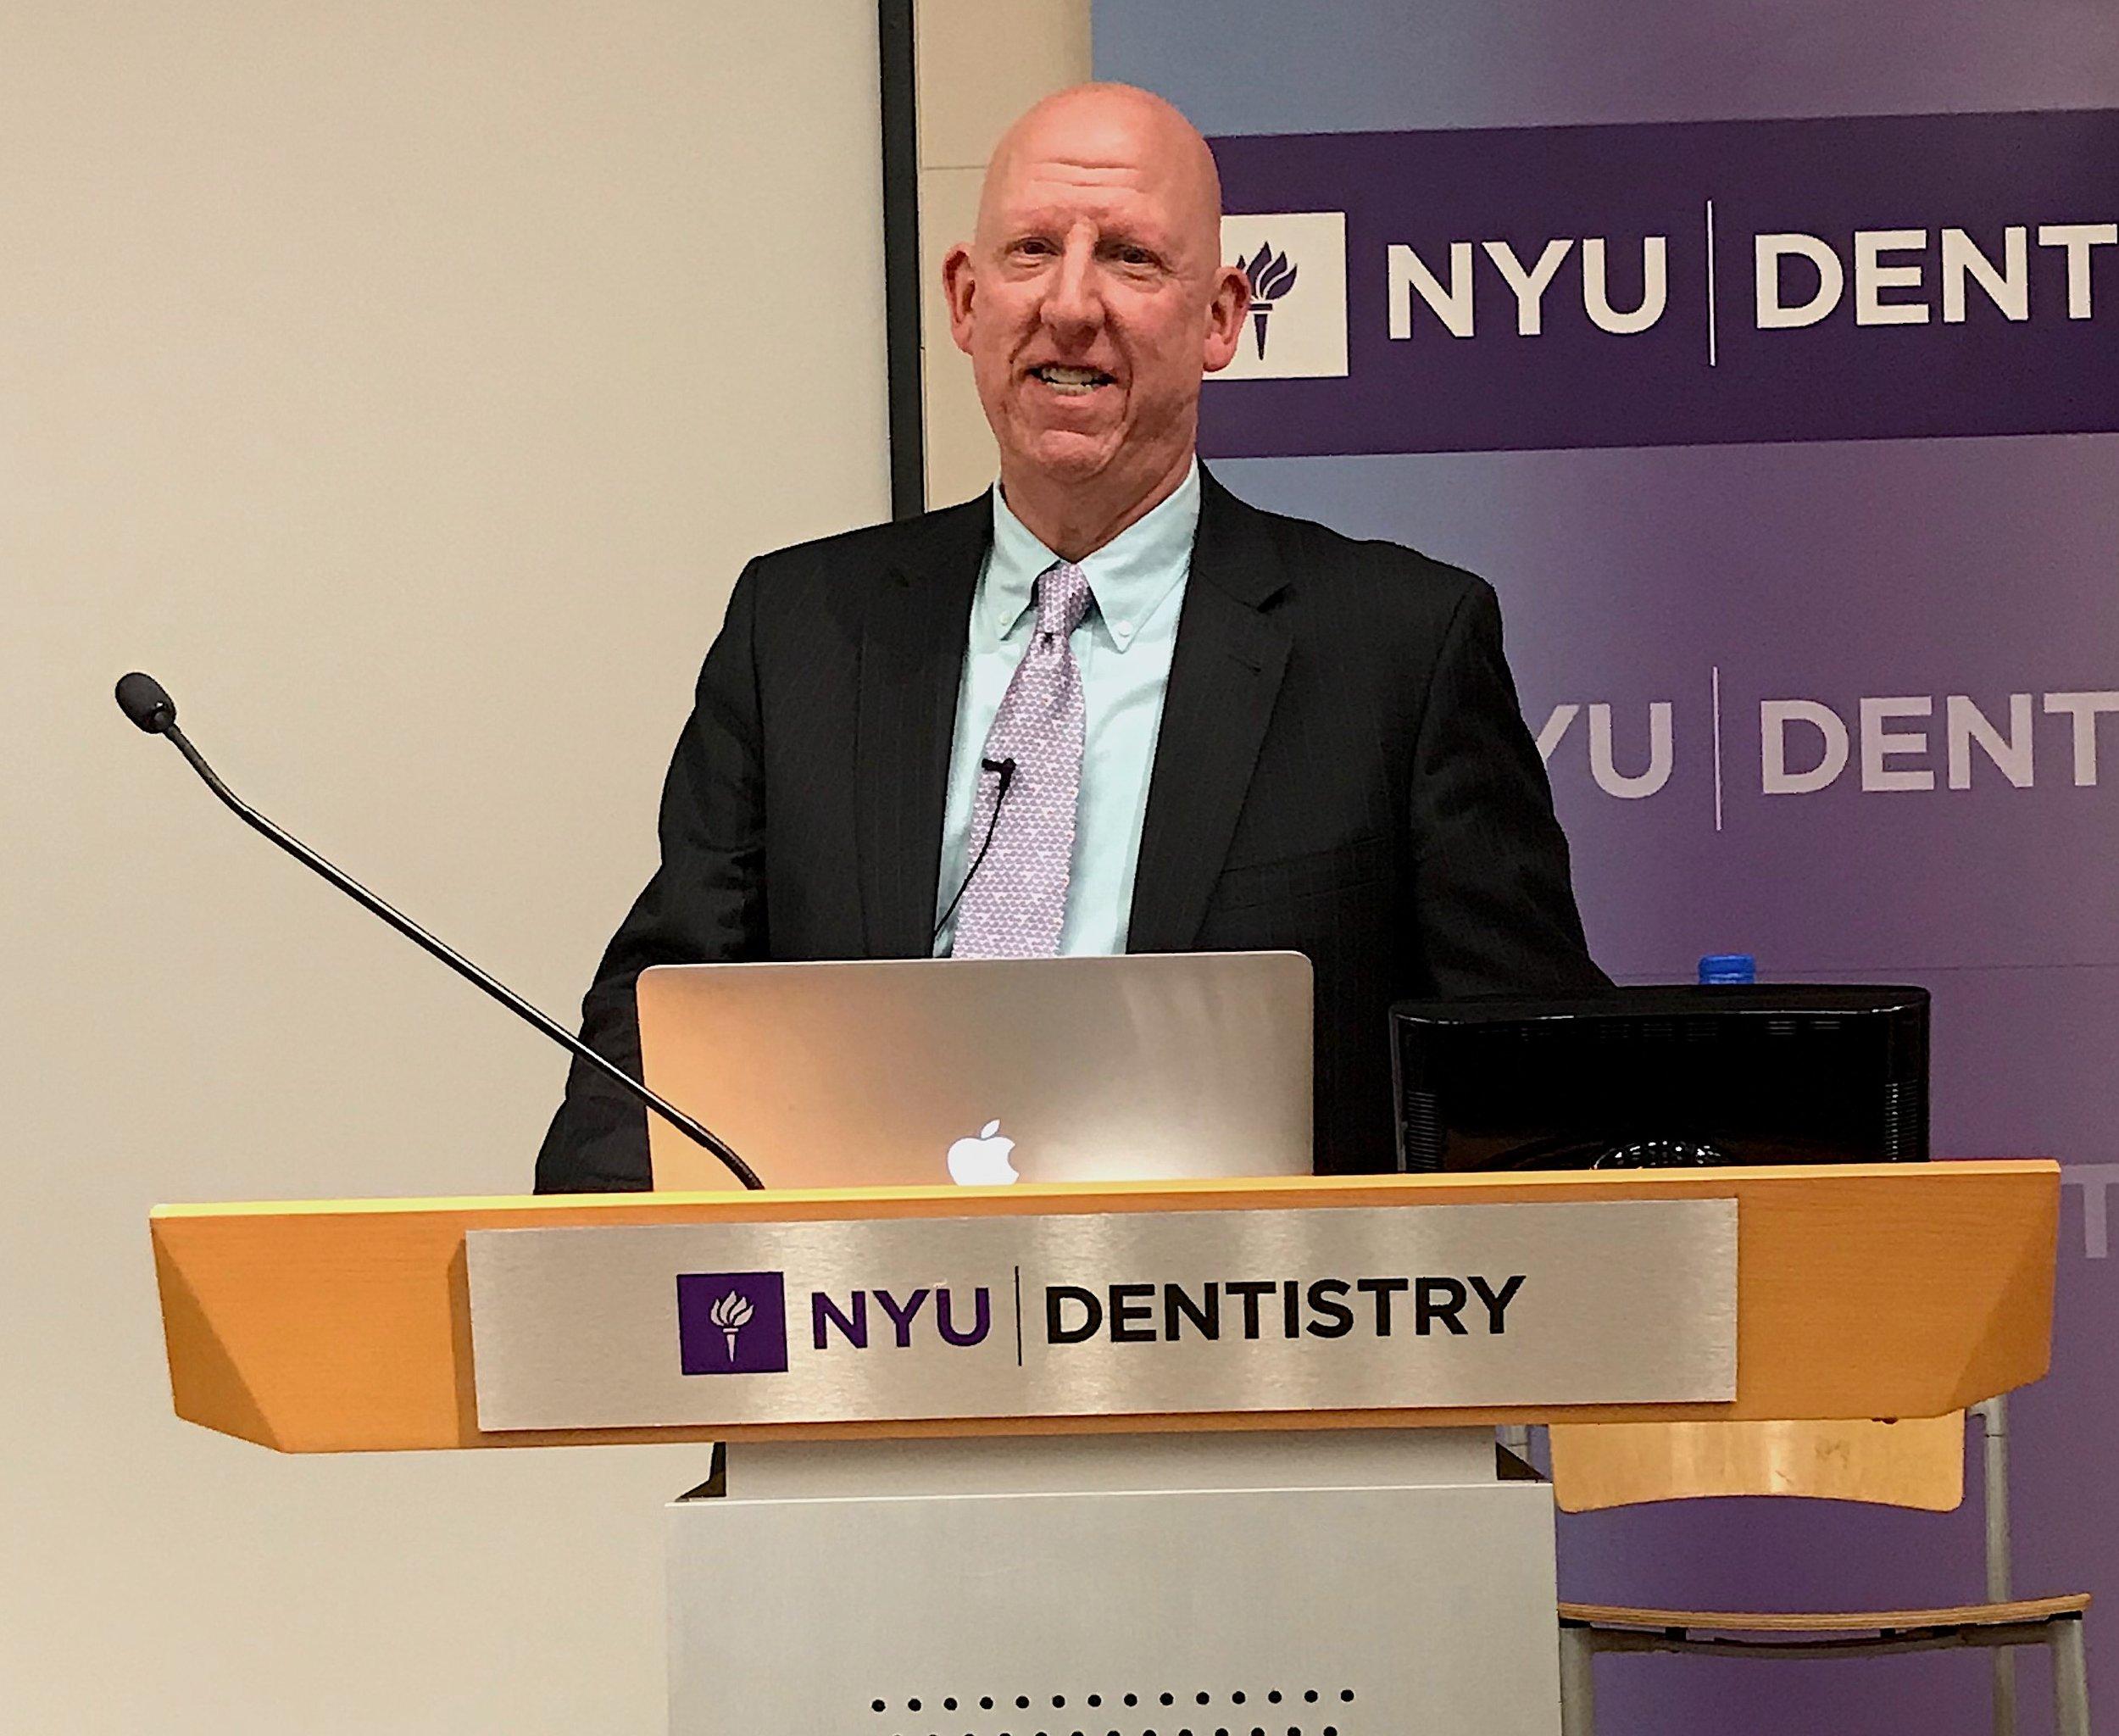 NYU international program Advanced implant lecture1.jpg